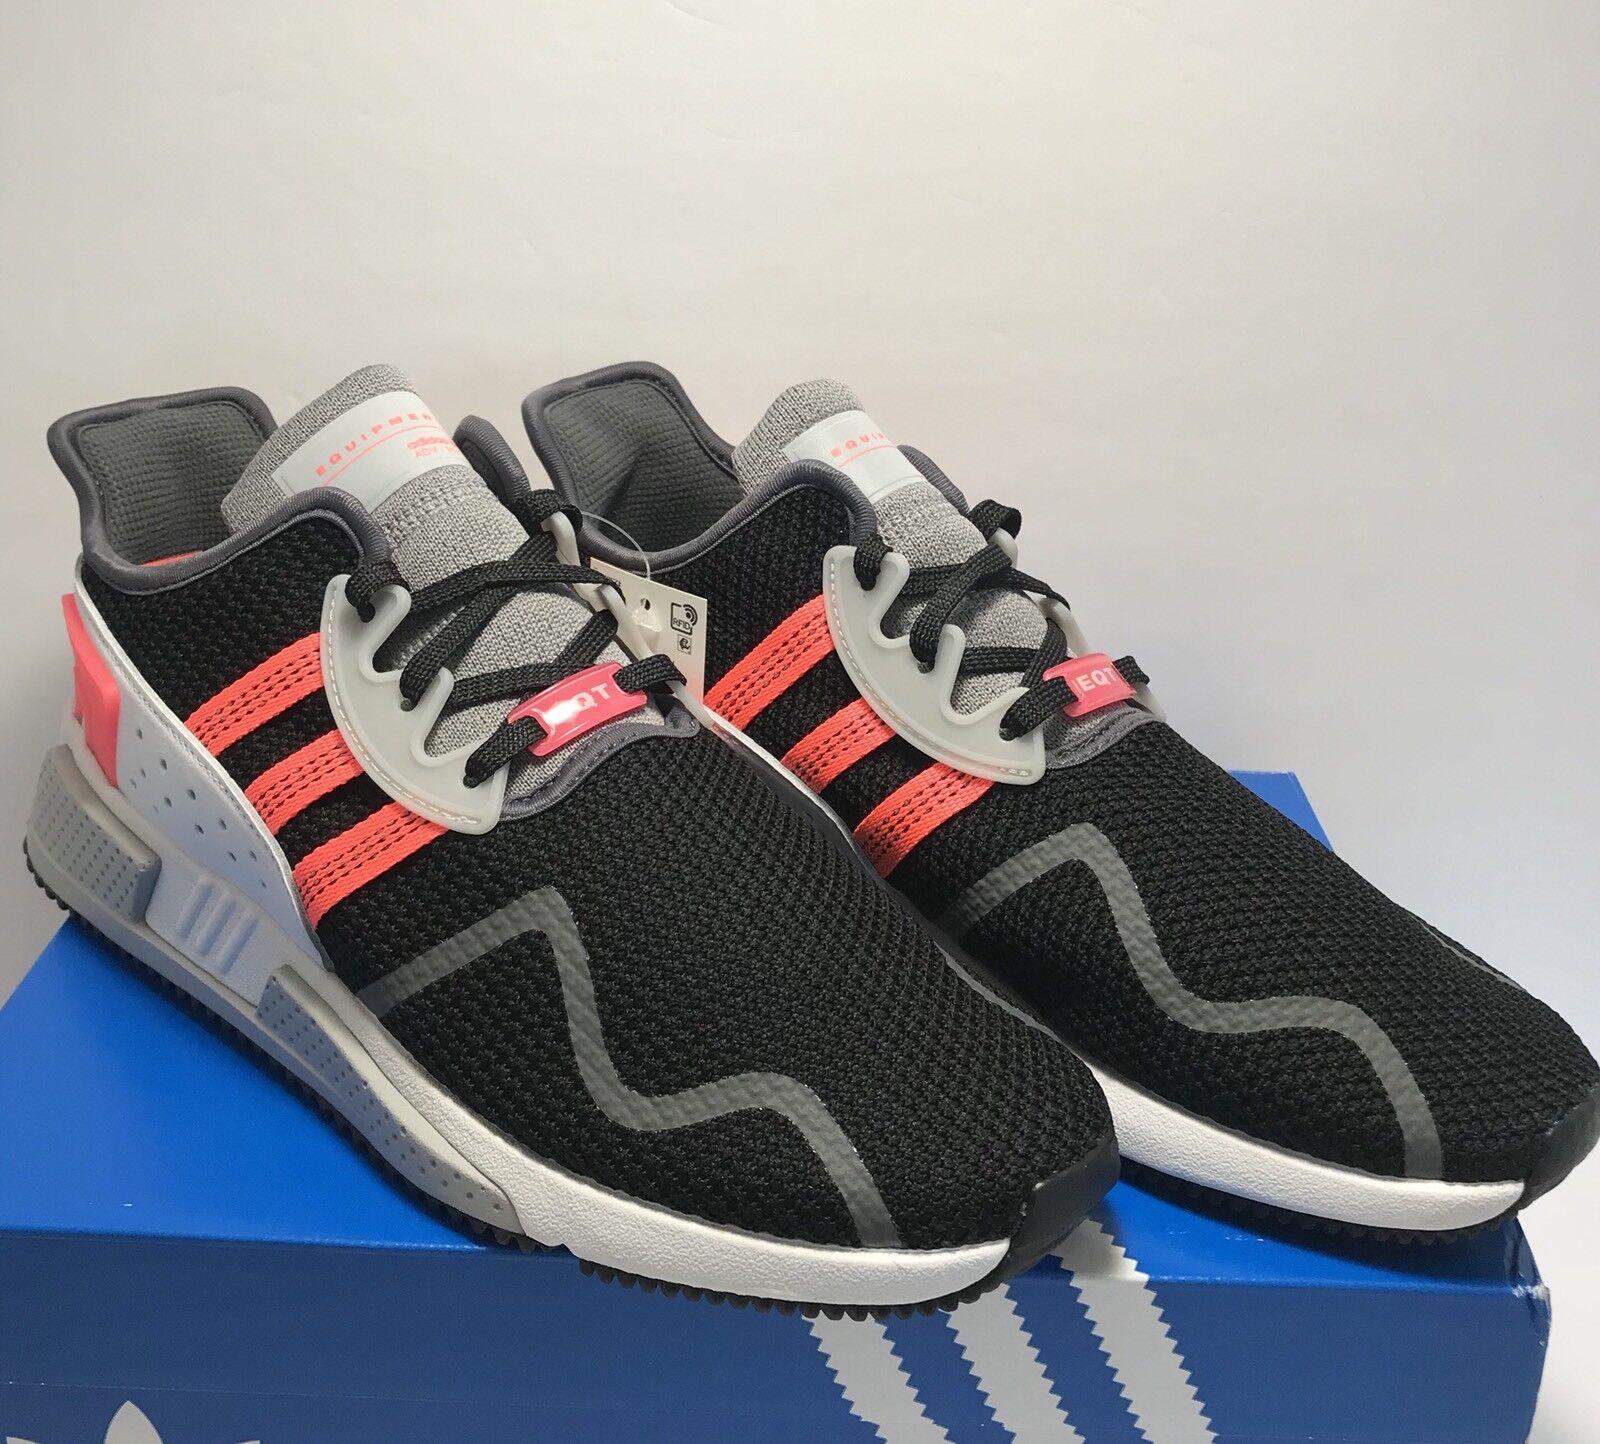 Adidas Uomo Size 11 EQT Cushion Adv Originals Training Shoe Nero Pink White